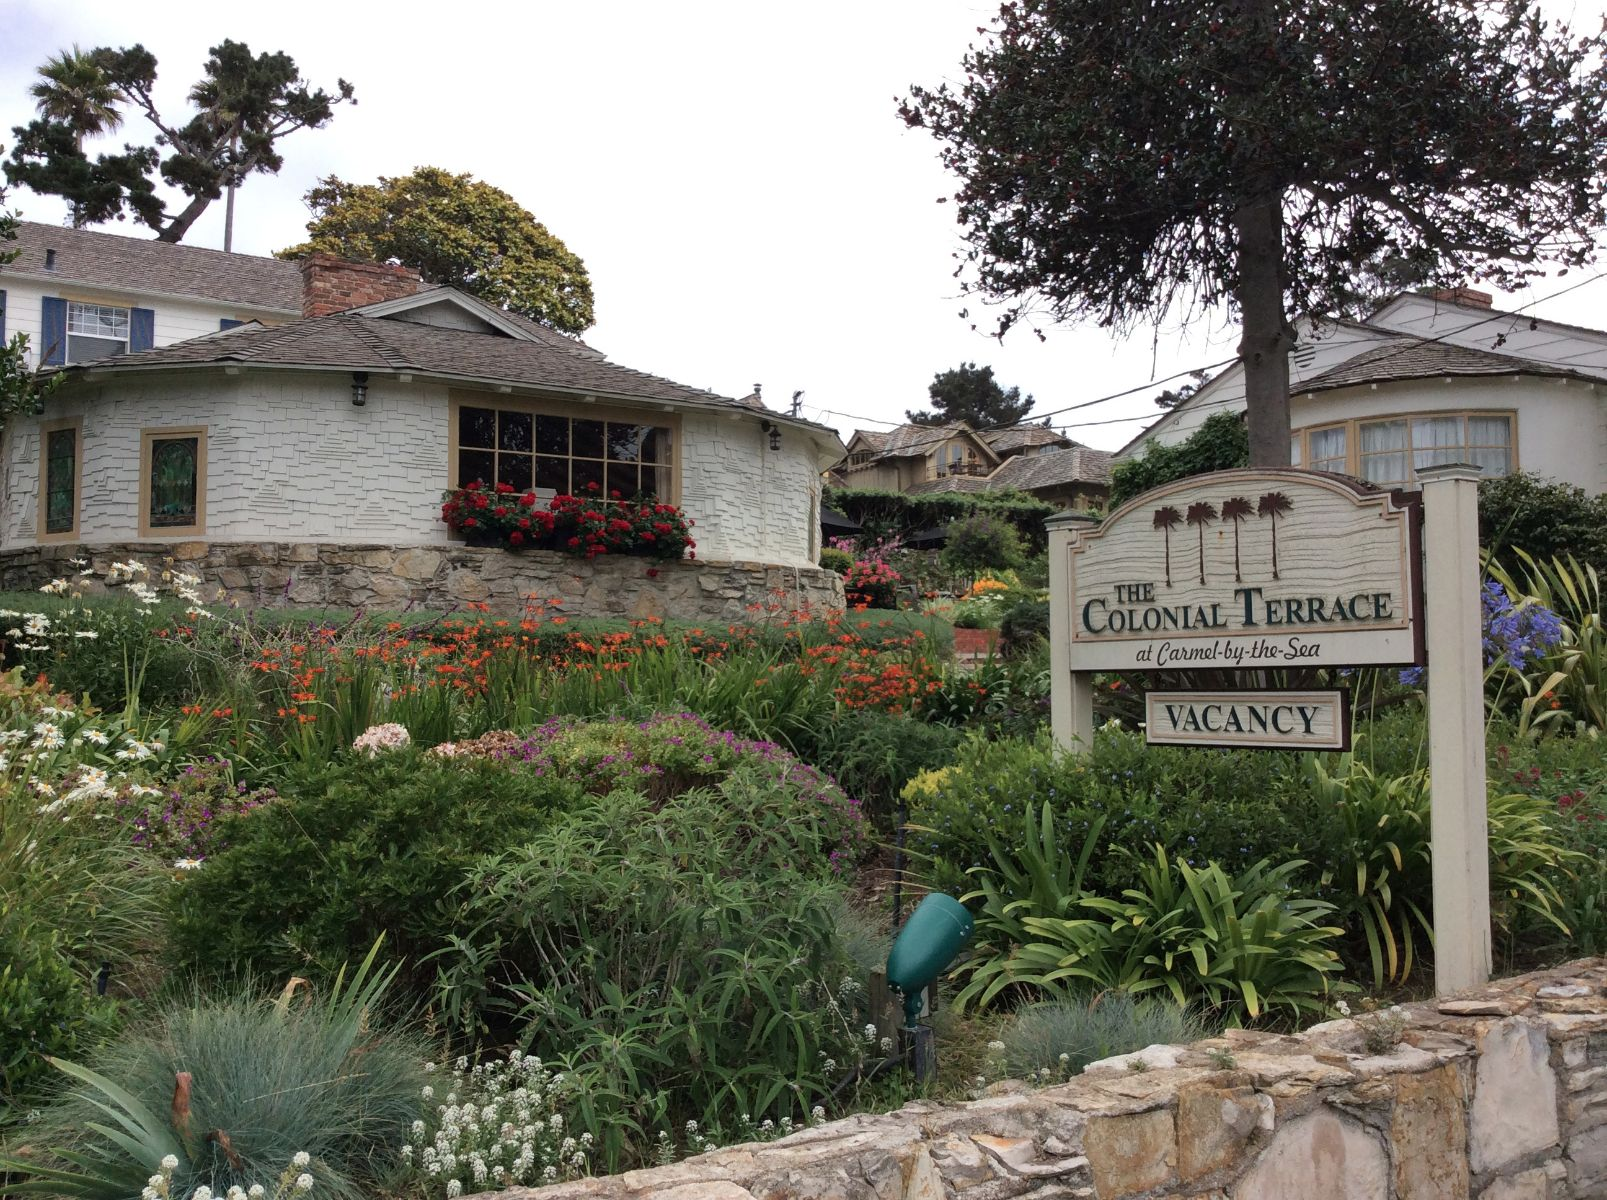 The Colonial Terrace Inn and Garden